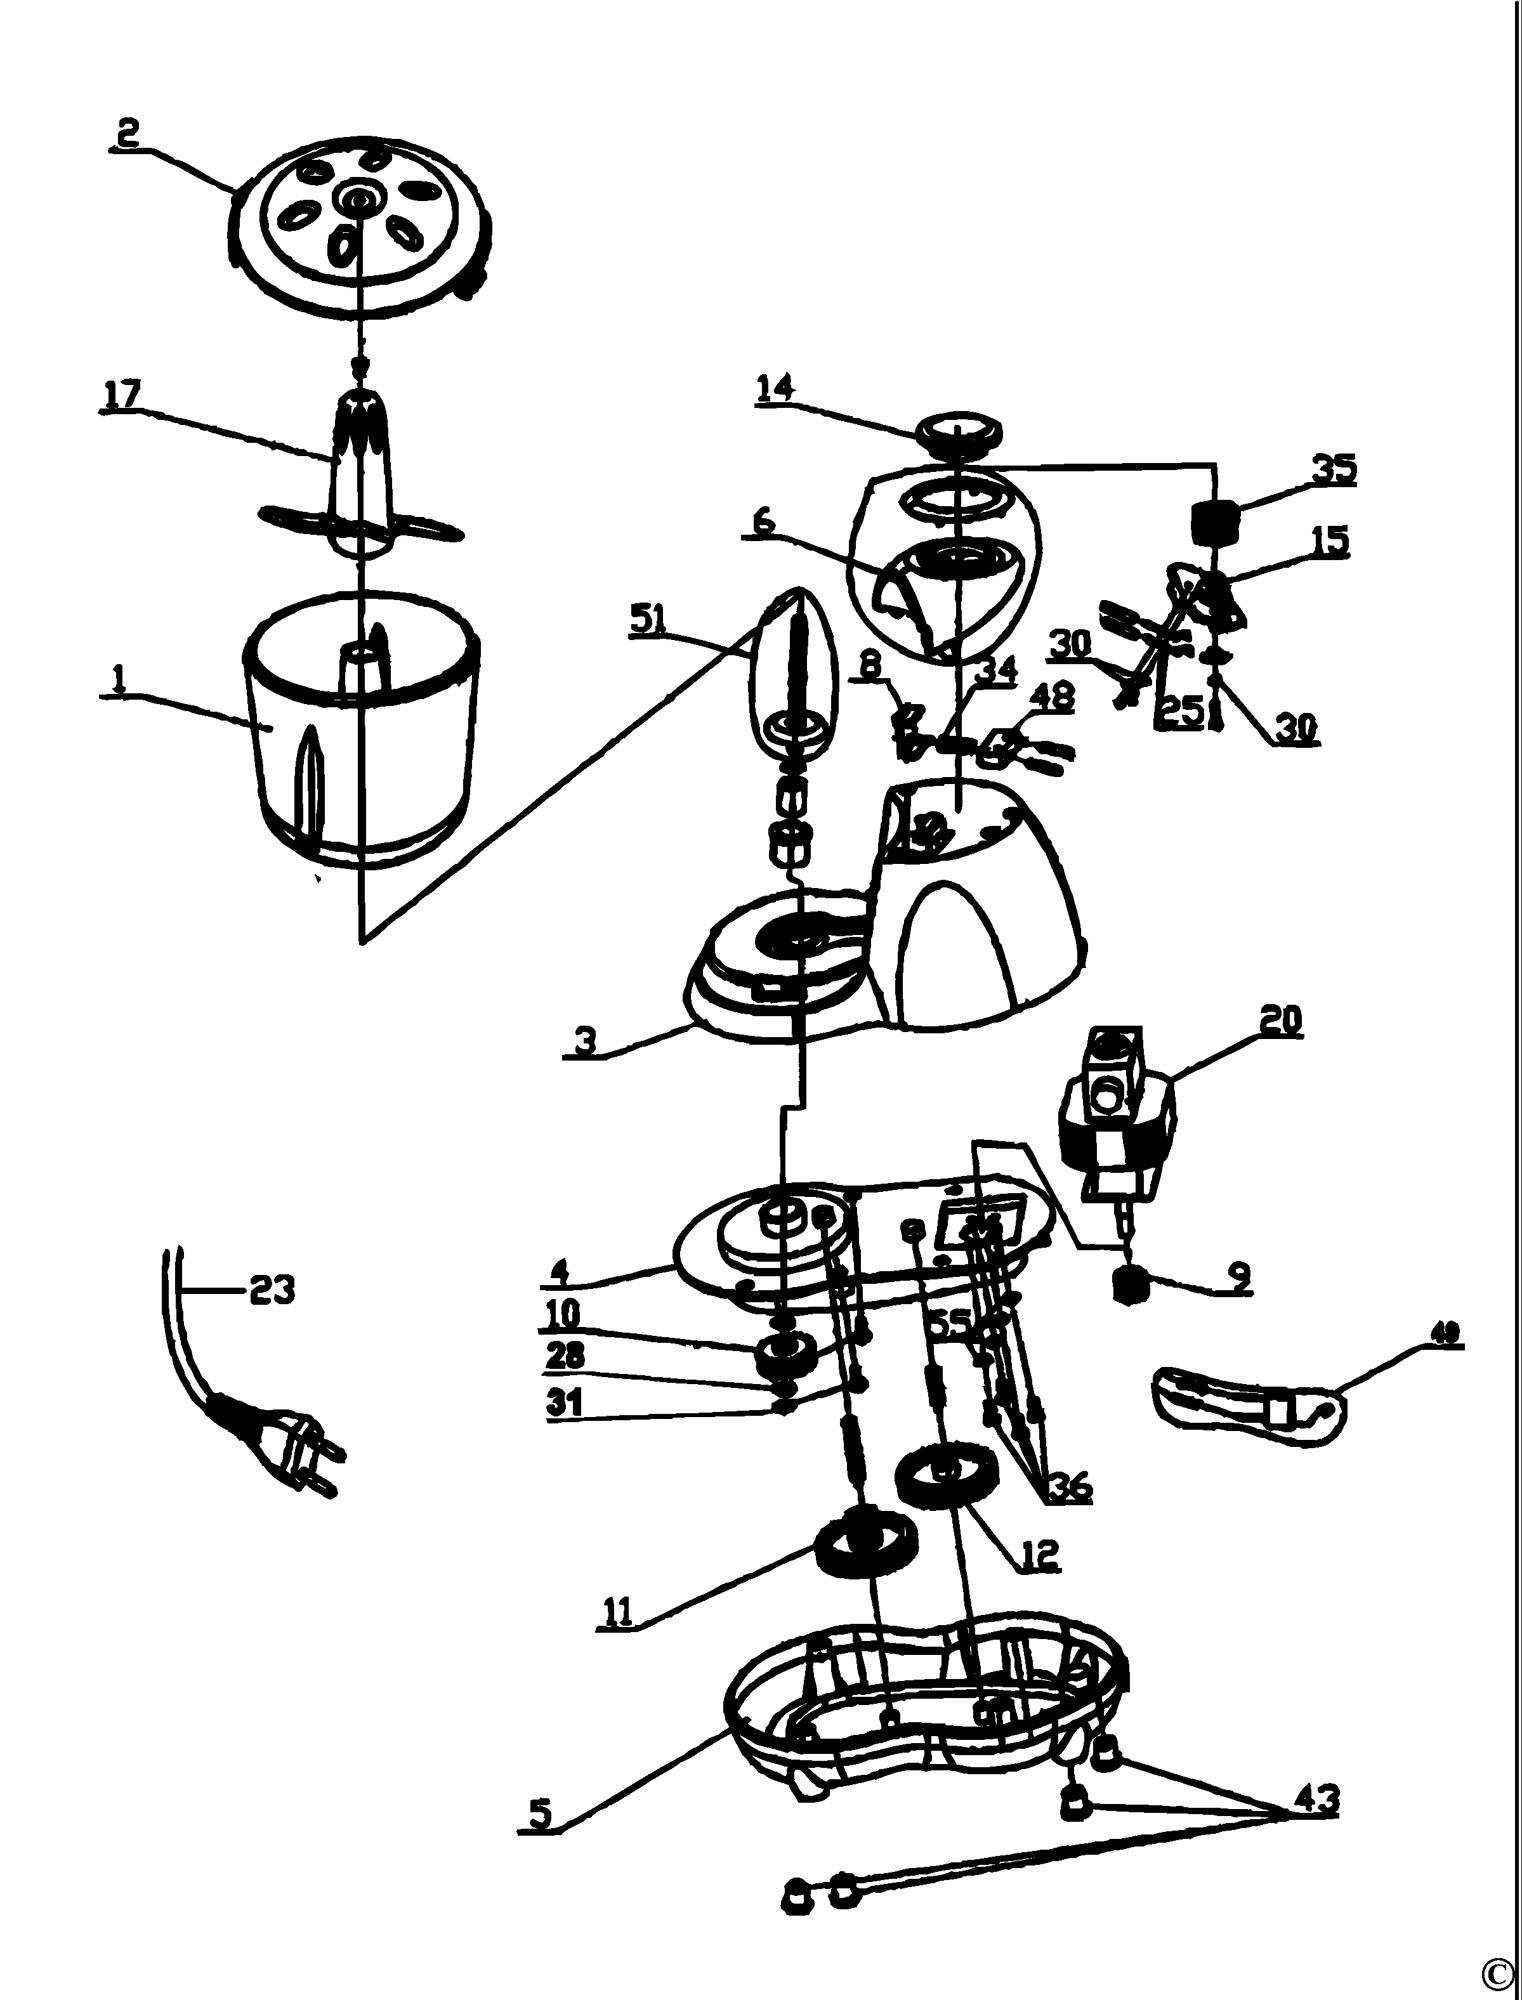 virago 250 wiring diagram 2004 chevy silverado 1500 stereo for 1994 yamaha 1100